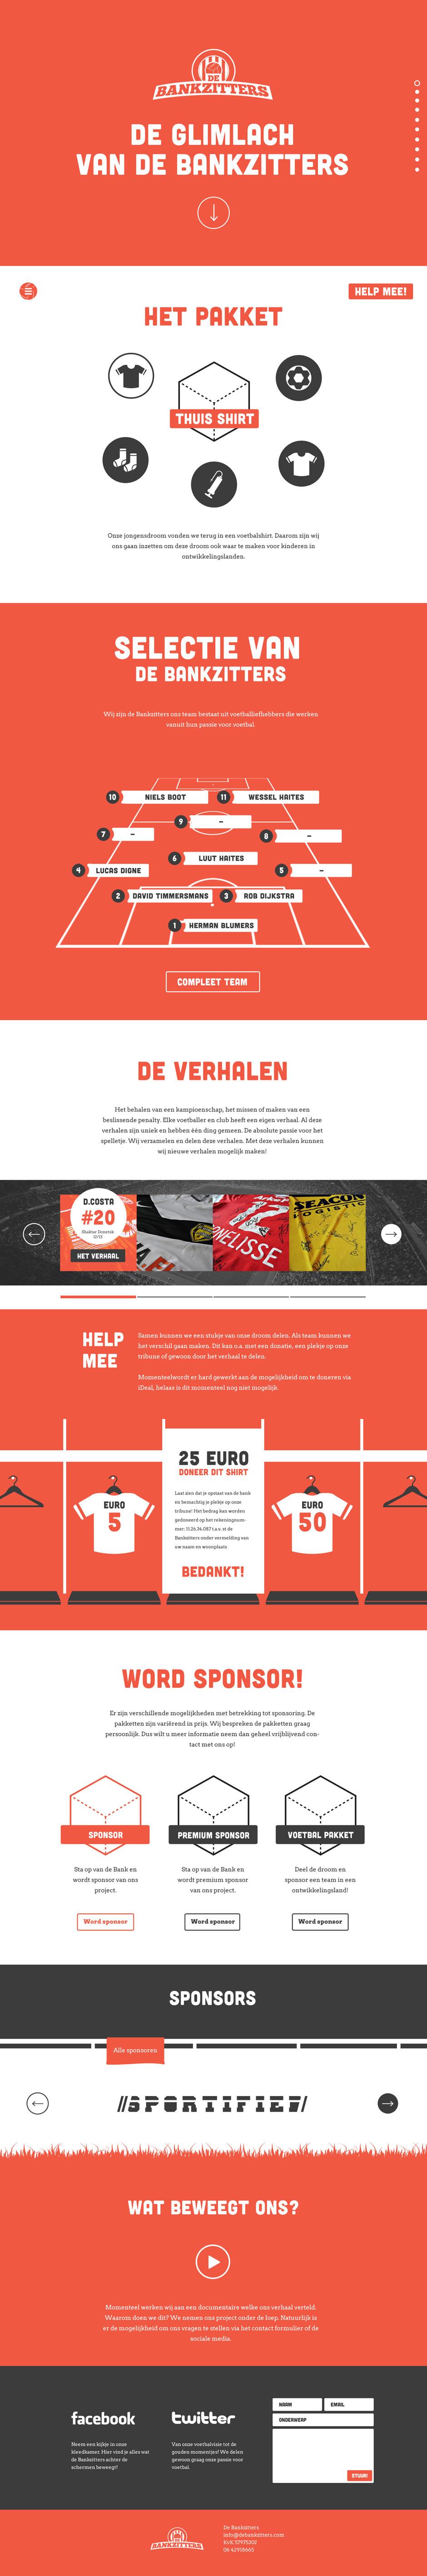 stom-web-bankzitters